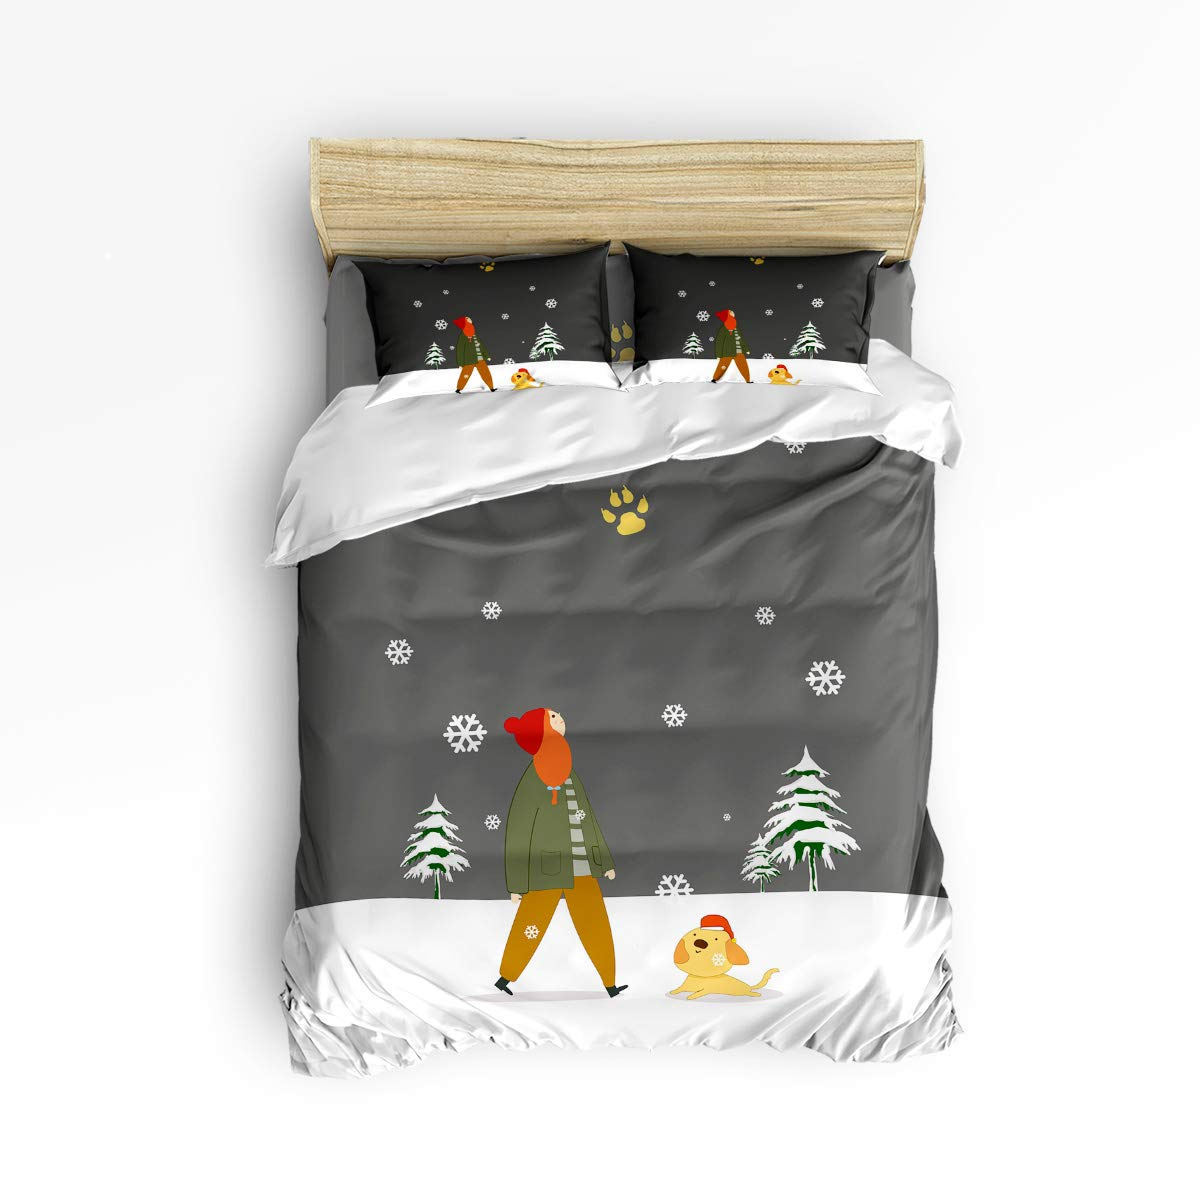 Anzona 4ピース寝具セット クリスマスガール 子犬遊び クリスマスツリー 雪の結晶 グレー 背景 画像 4ピース 羽毛布団カバーセット ベッドスプレッド 子供/子供/ティーン/大人用 Twin Size 181115MCsjtZLYanzo-SWTQ00866SJTAAZN B07KMT2BP8 Snowdogazn5511 Twin Size